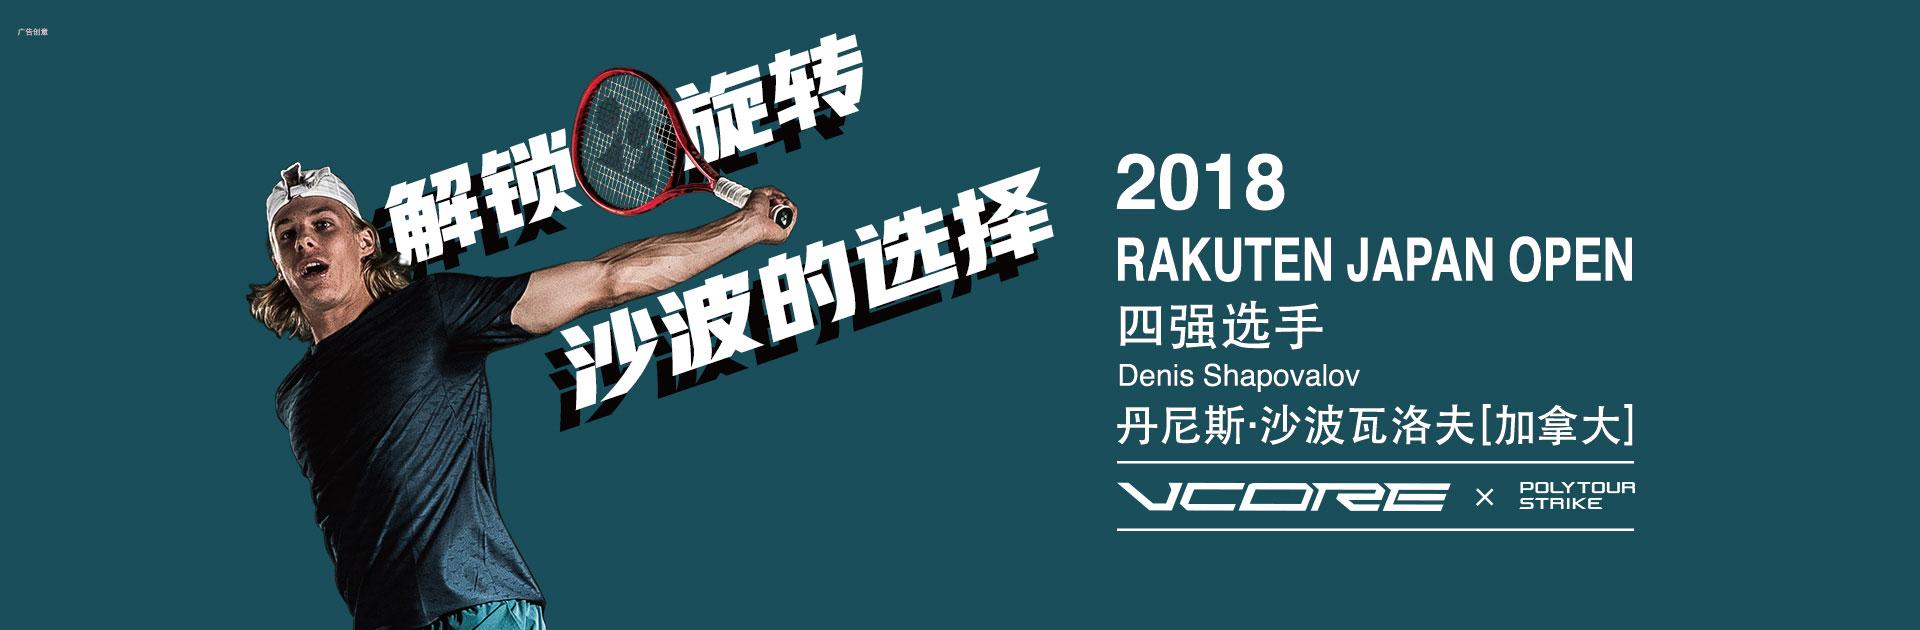 2018 Rakuten Japan Open | 沙波瓦洛夫闯入四强